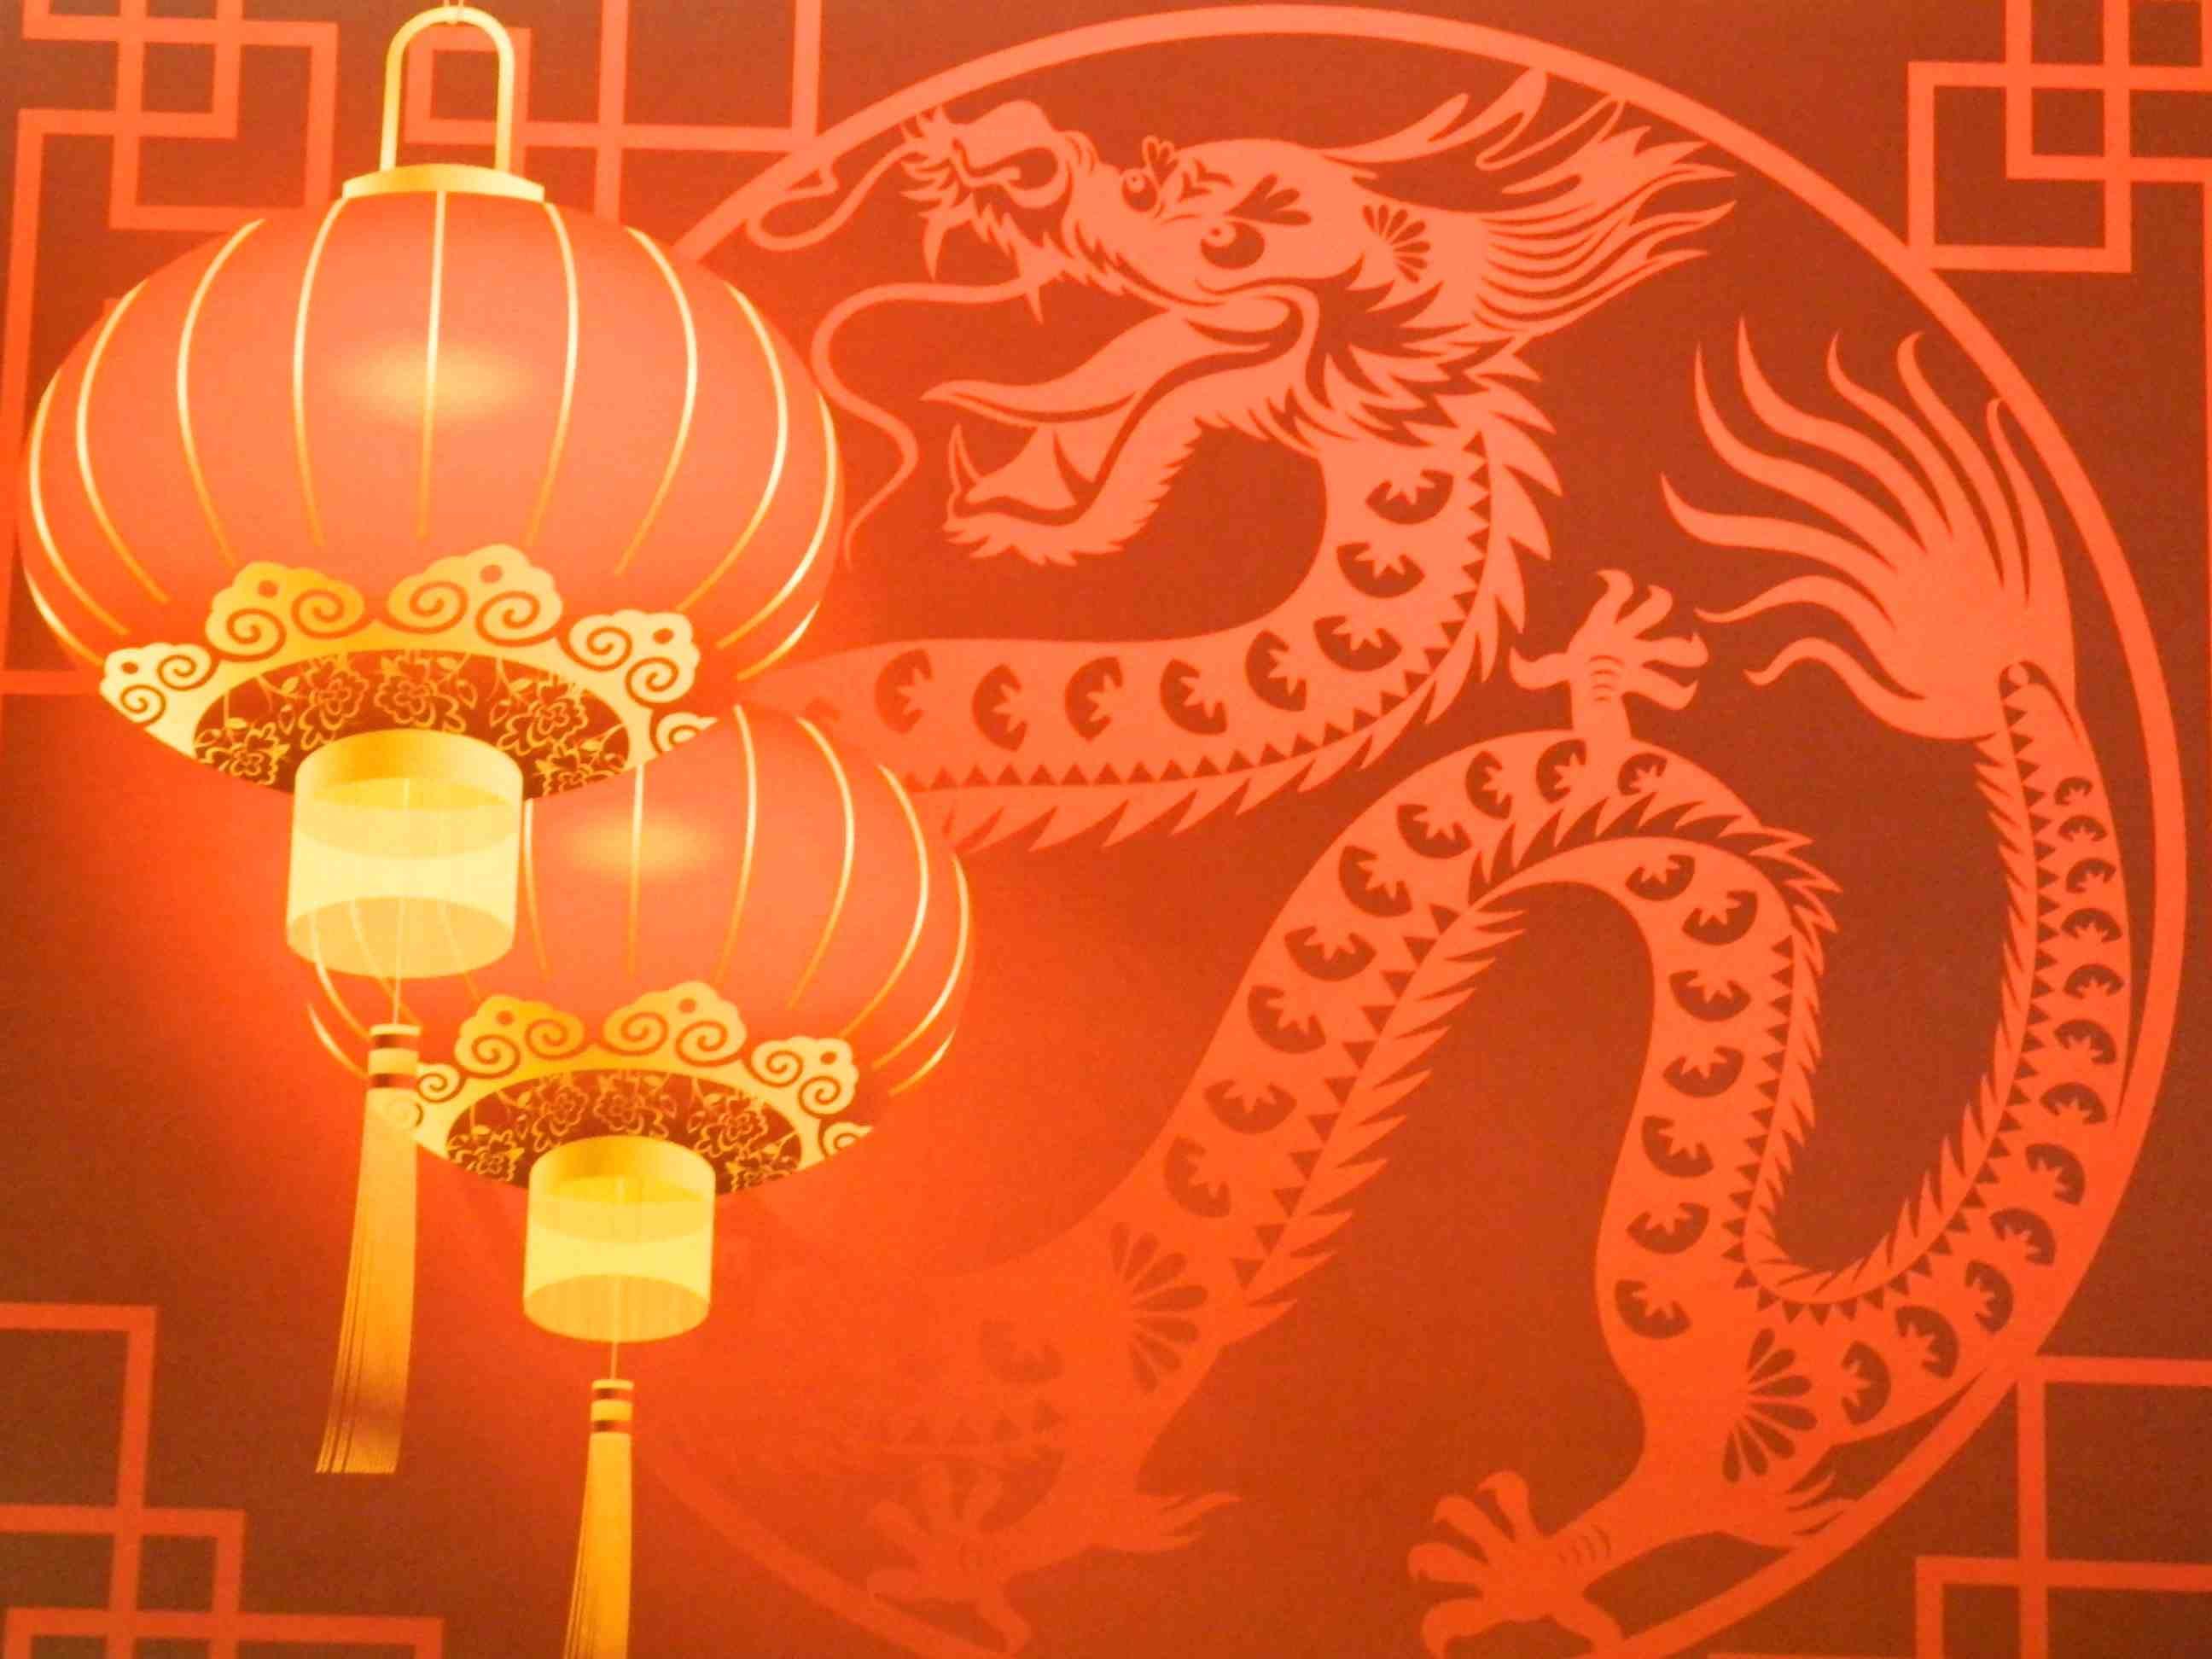 Chinese New Year Dragon 2015 Wallpaper